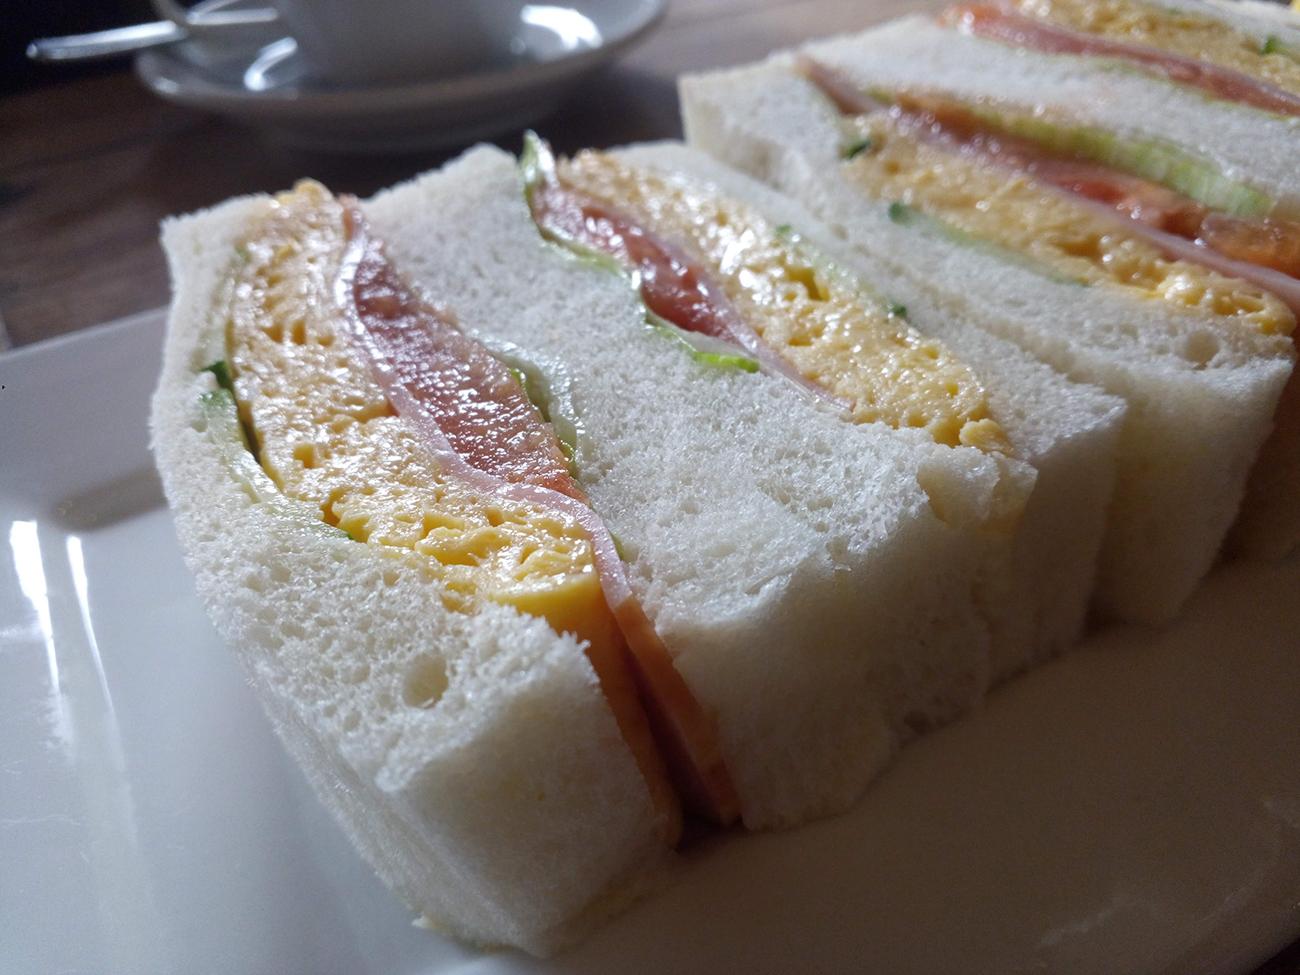 KINGKONG MINIのカメラで撮影したサンドイッチ